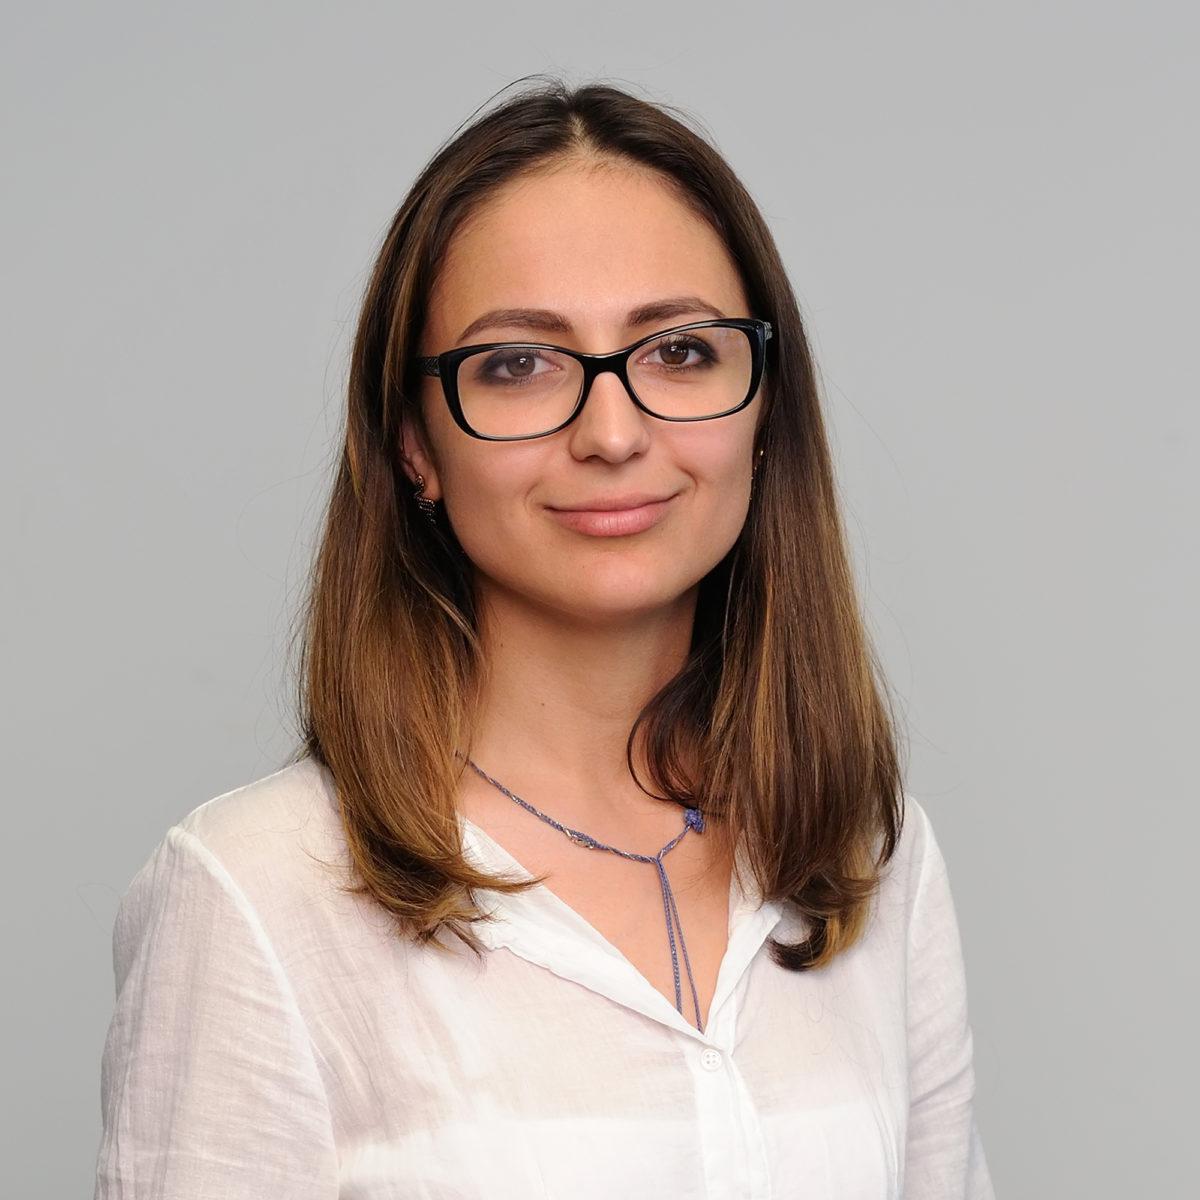 Лобанова Екатерина Олеговна